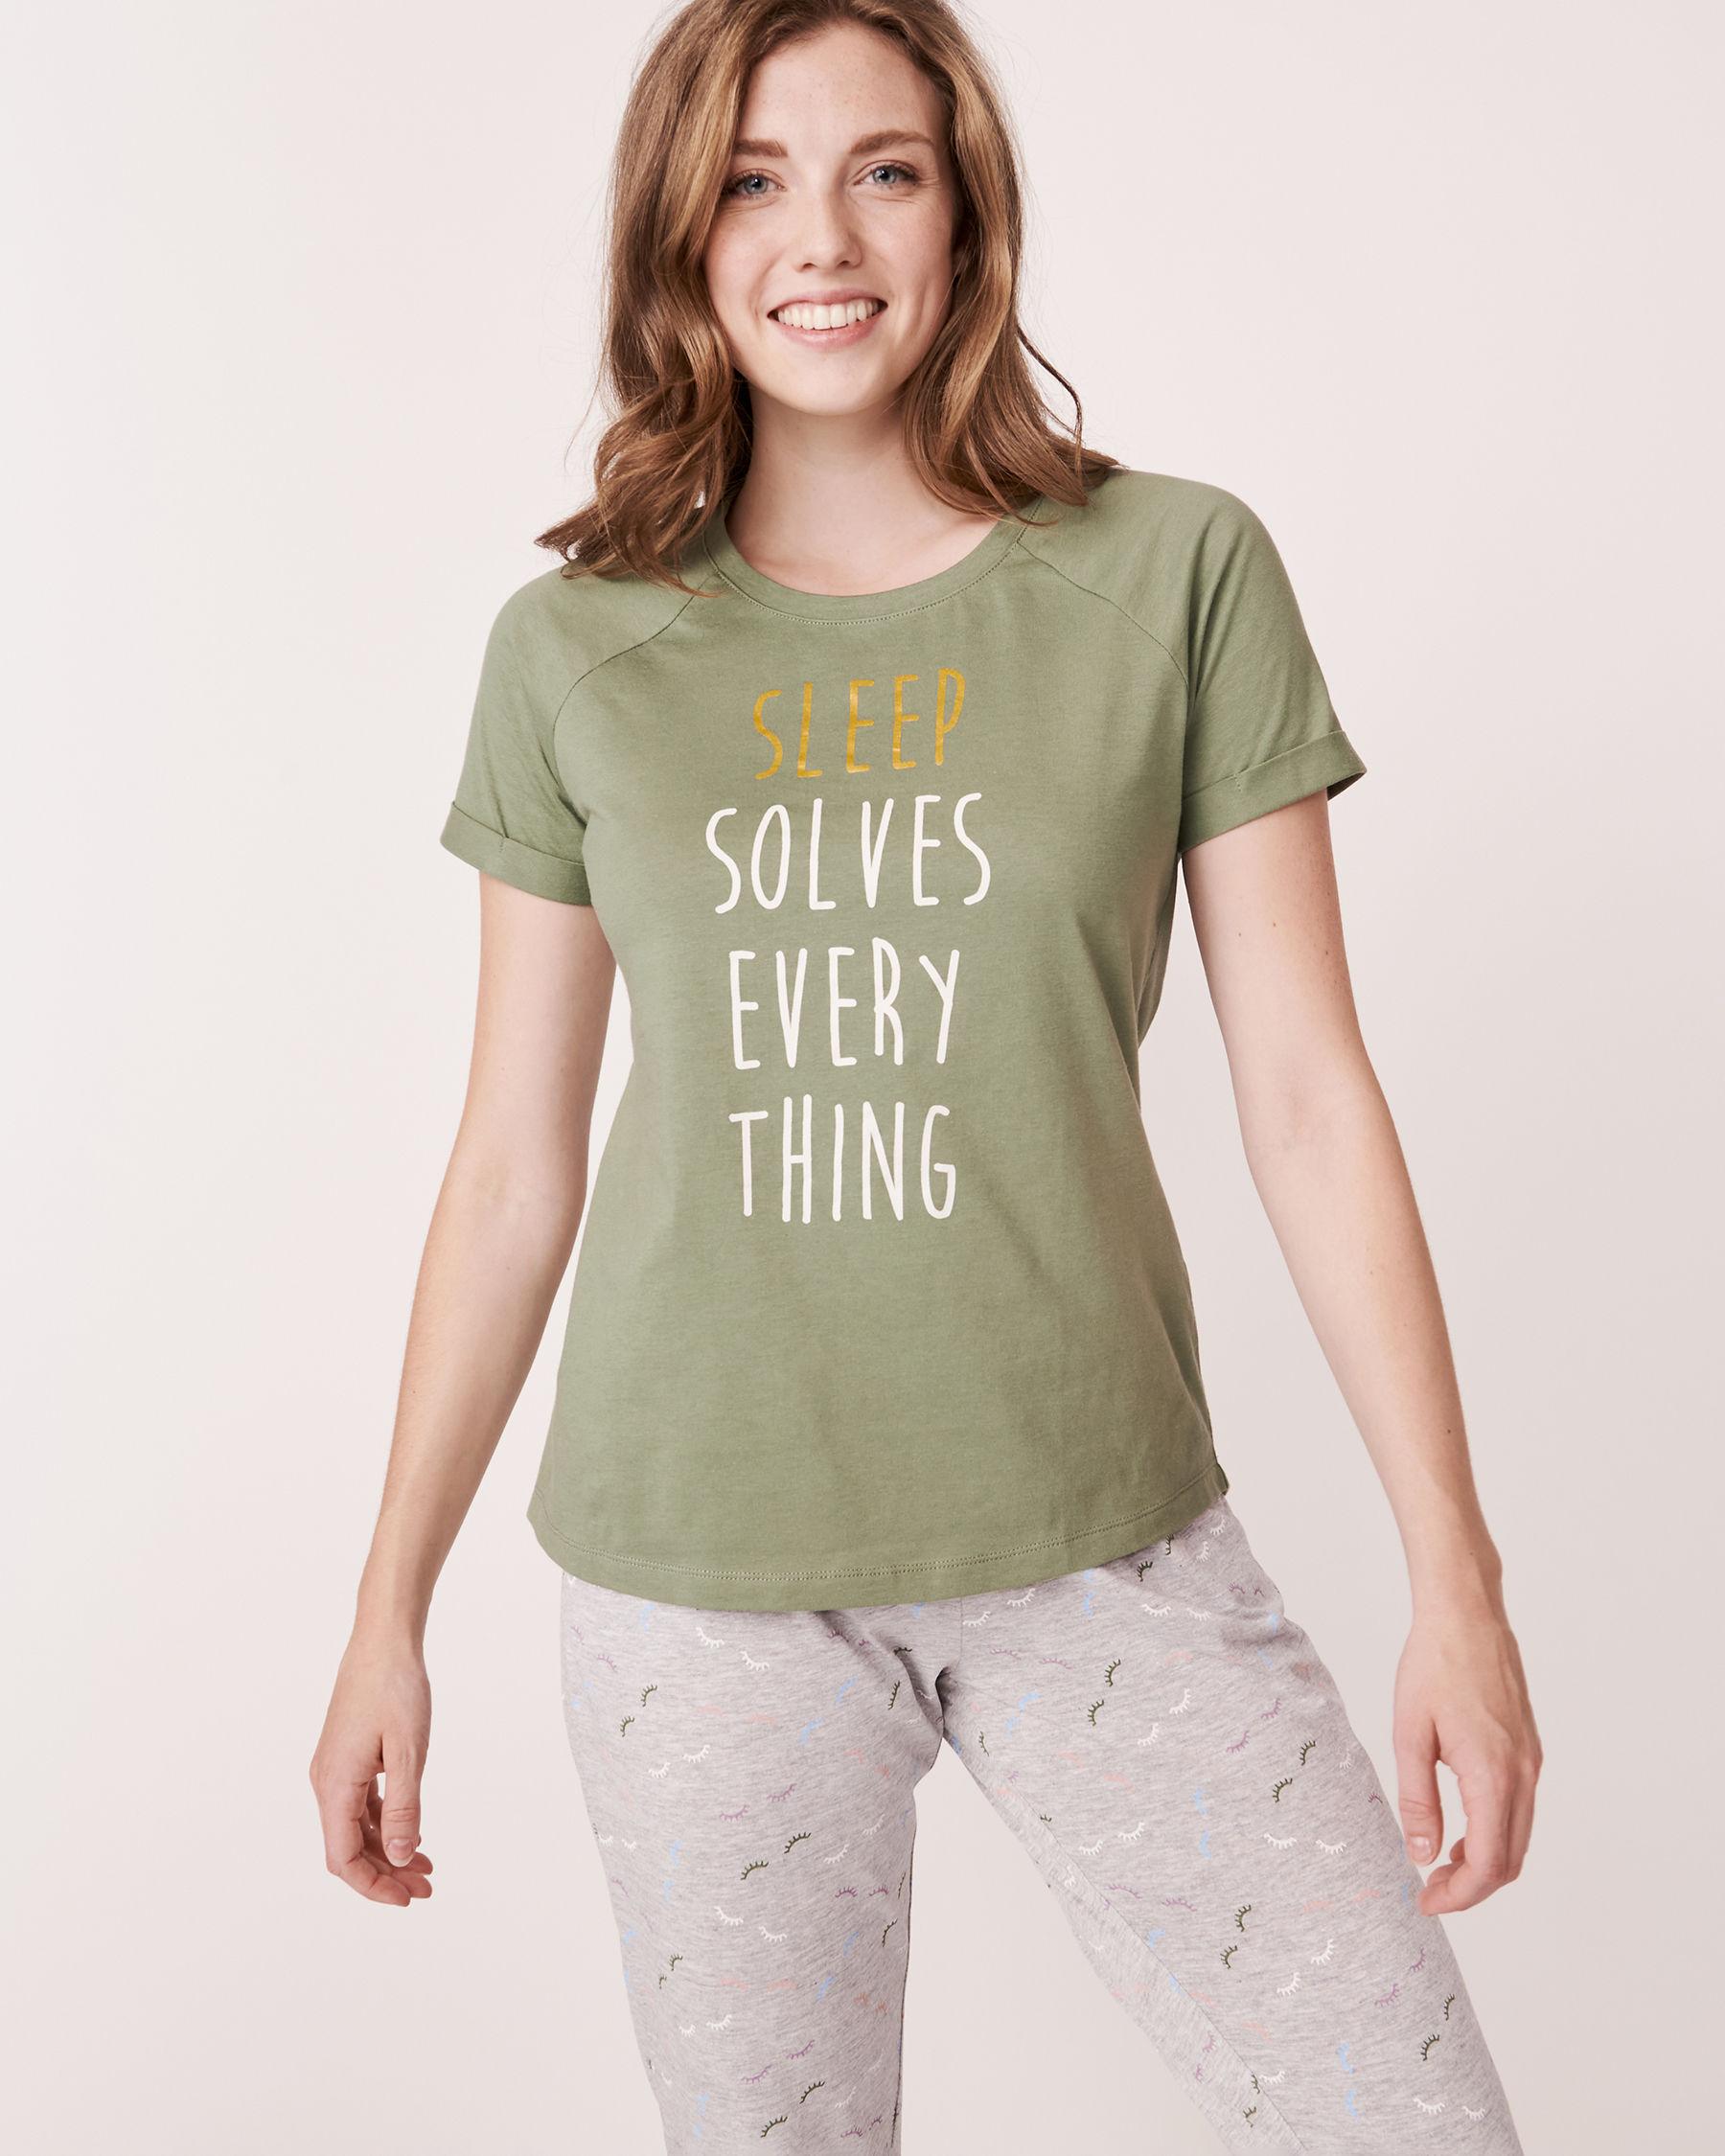 LA VIE EN ROSE Raglan Short Sleeves Shirt Khaki 880-386-1-11 - View1